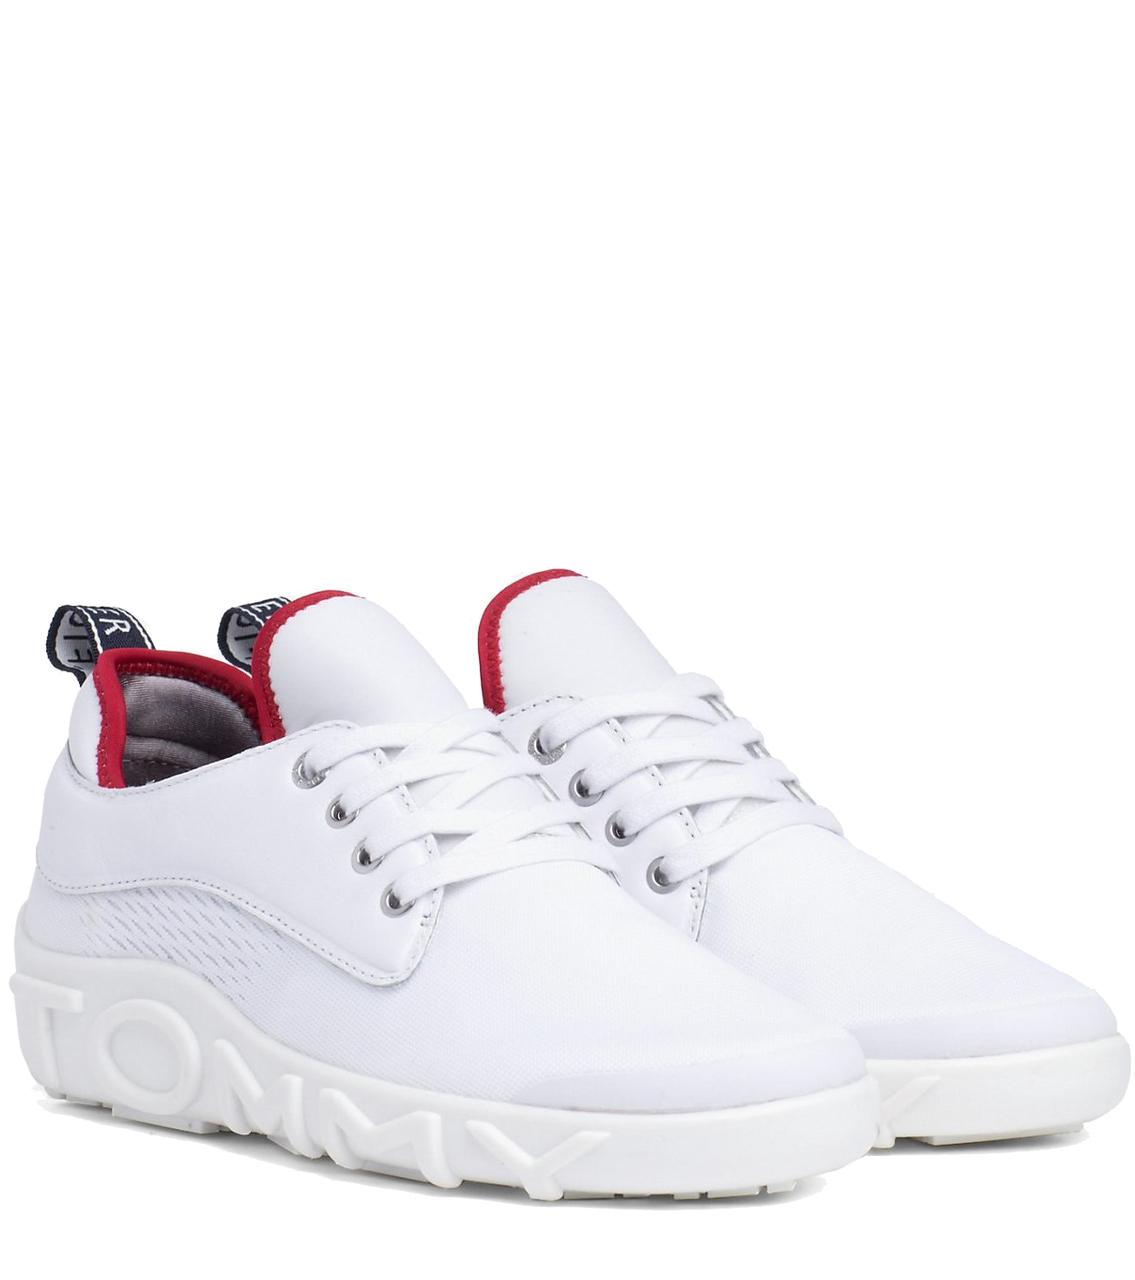 9c64ee8f9b61c Tommy Hilfiger biele tenisky Knit Tommy Sneaker RWB - Glami.sk